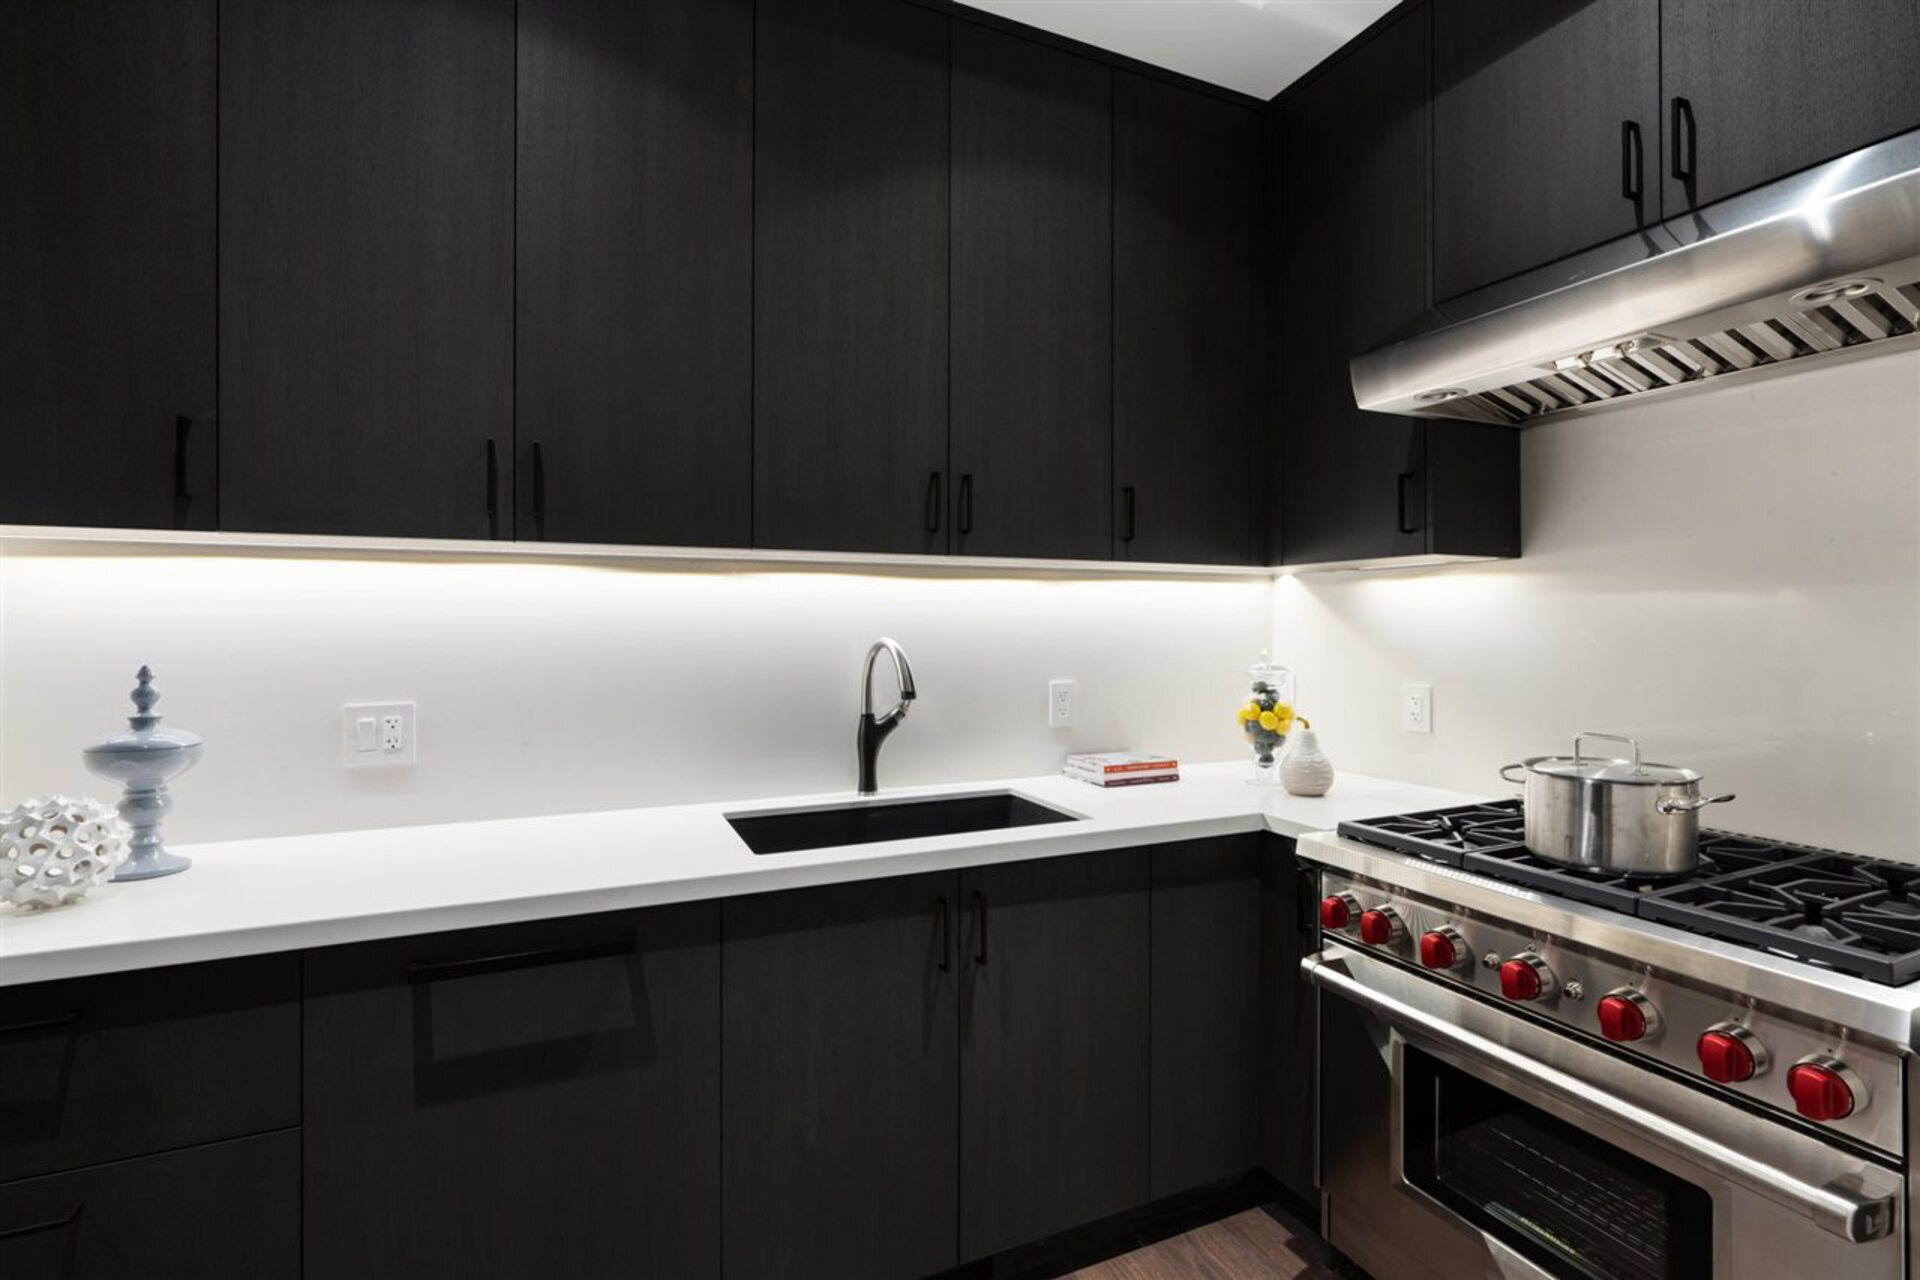 1040-wildwood-lane-british-properties-west-vancouver-17 at 1040 Wildwood Lane, British Properties, West Vancouver